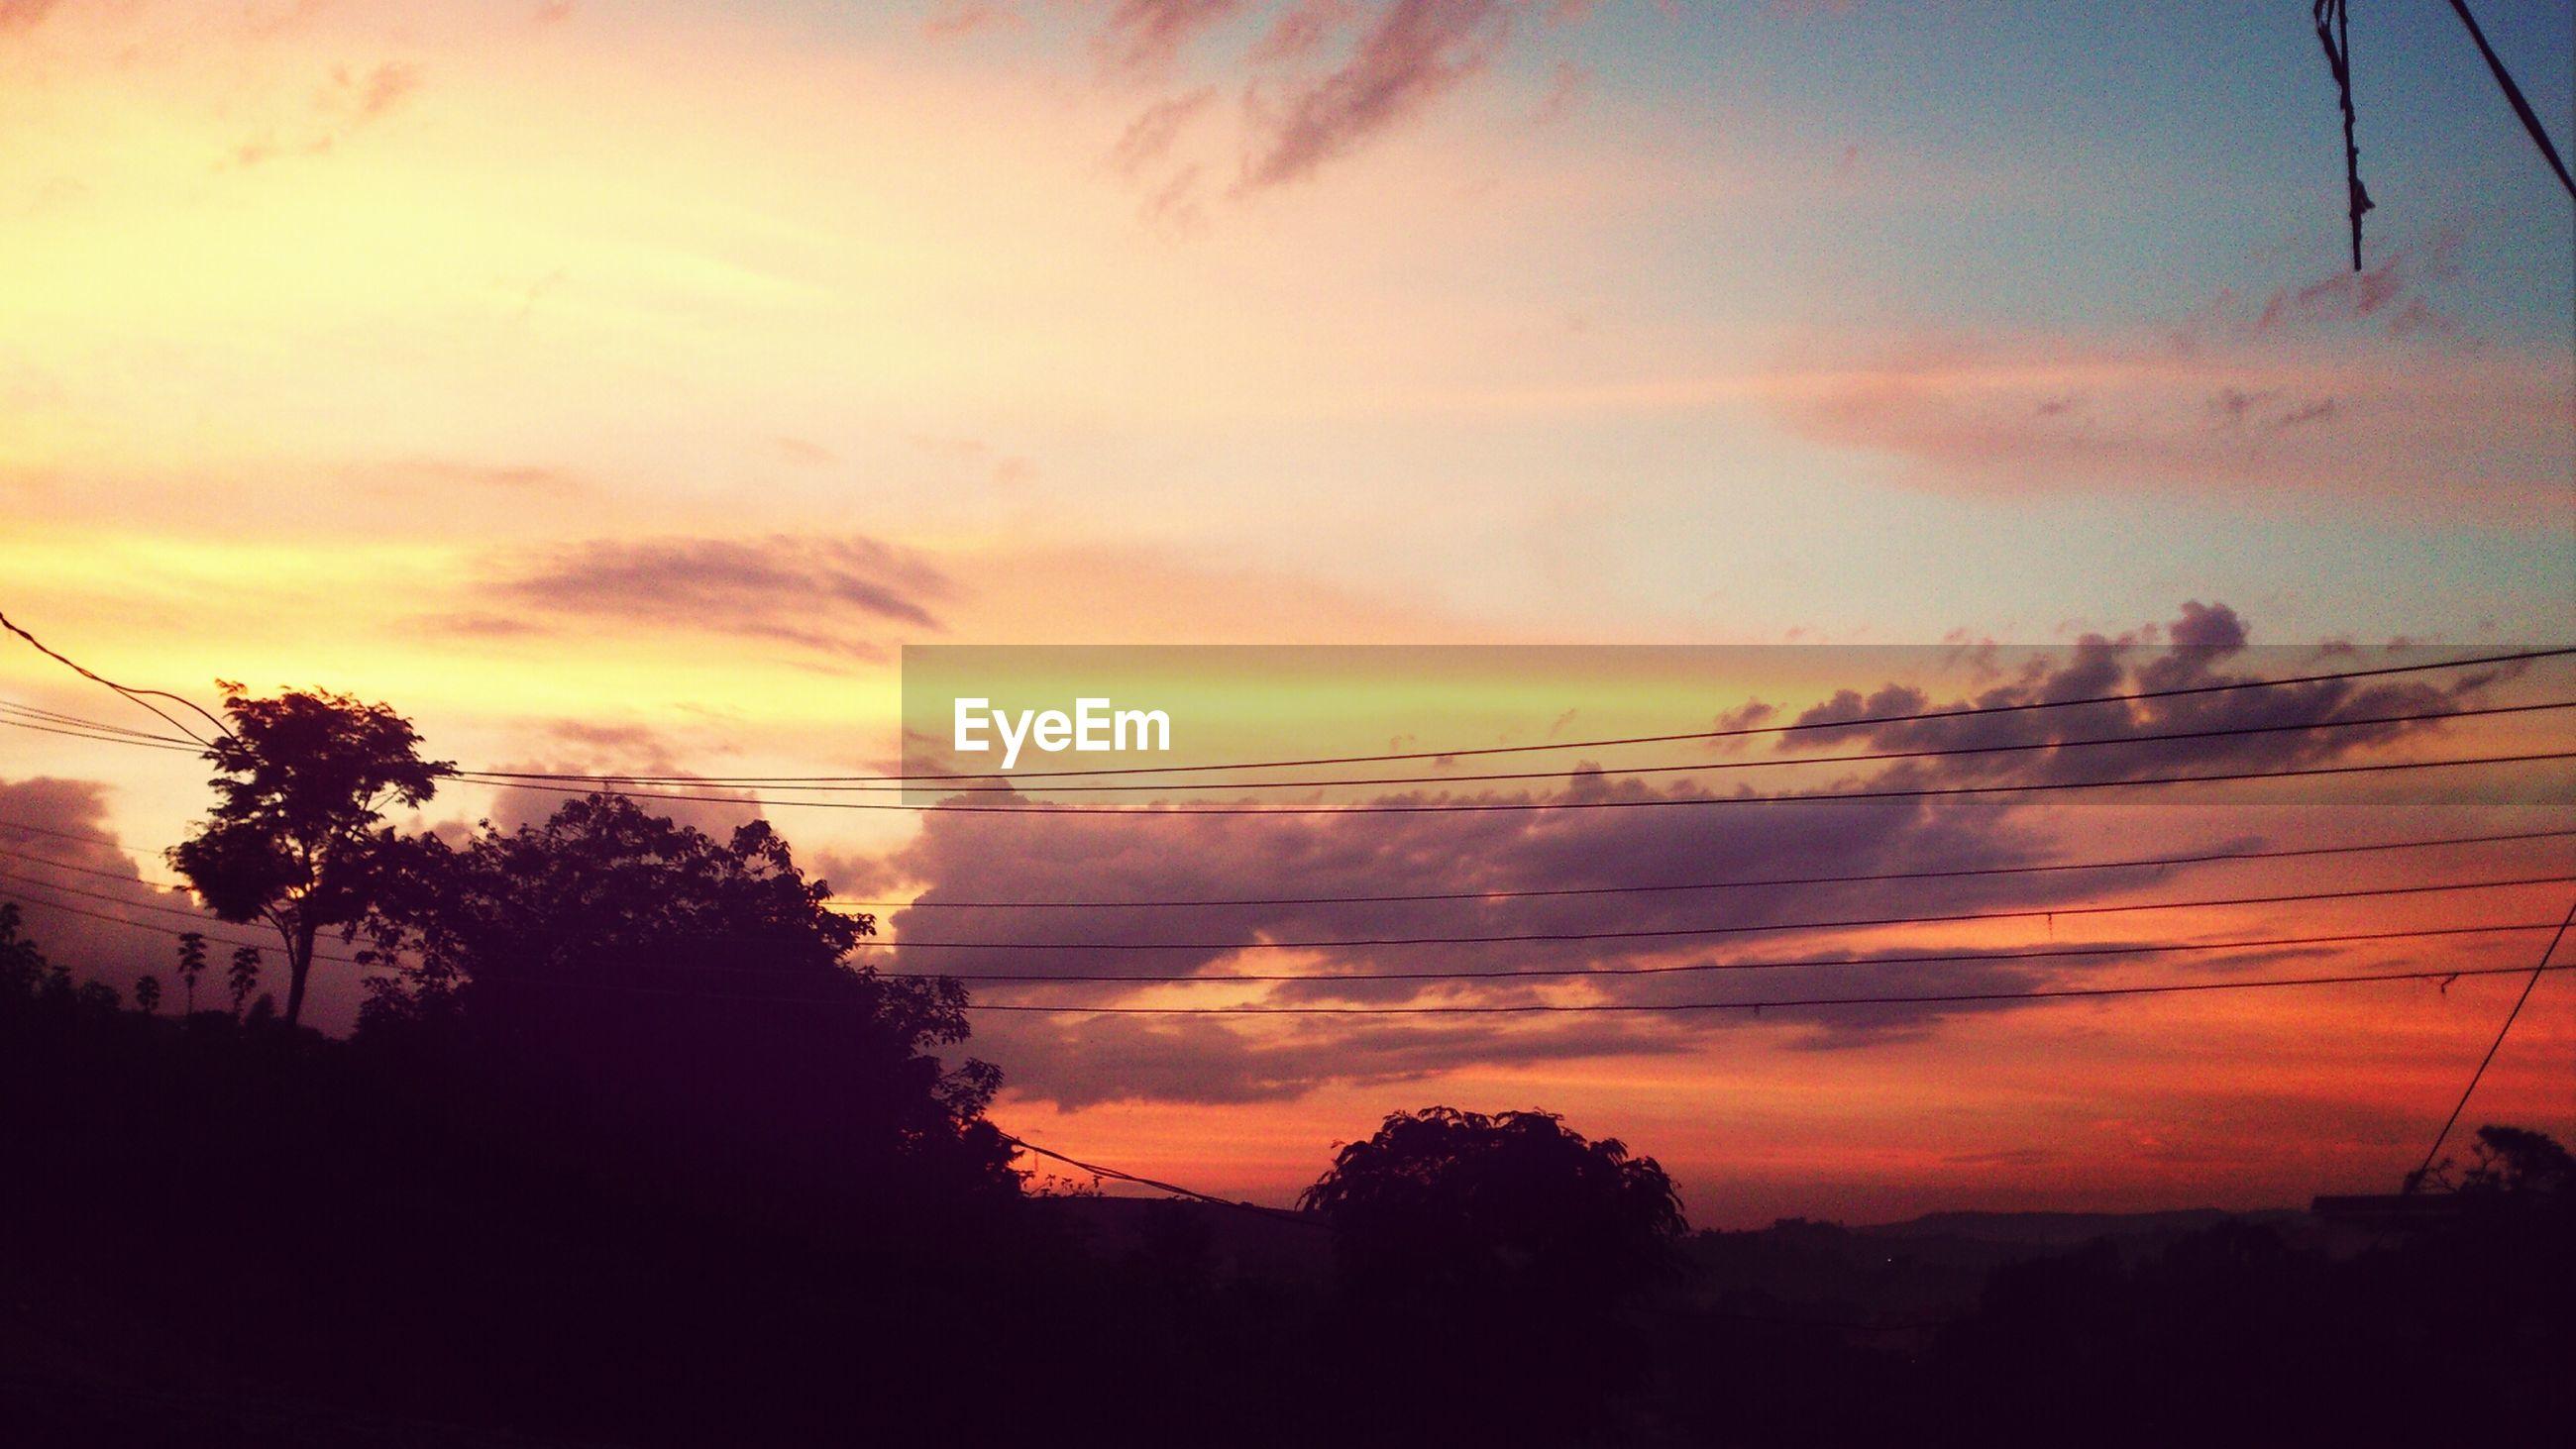 sunset, silhouette, sky, tree, scenics, beauty in nature, tranquil scene, tranquility, orange color, power line, cloud - sky, nature, electricity pylon, idyllic, cloud, dramatic sky, landscape, electricity, dusk, outdoors